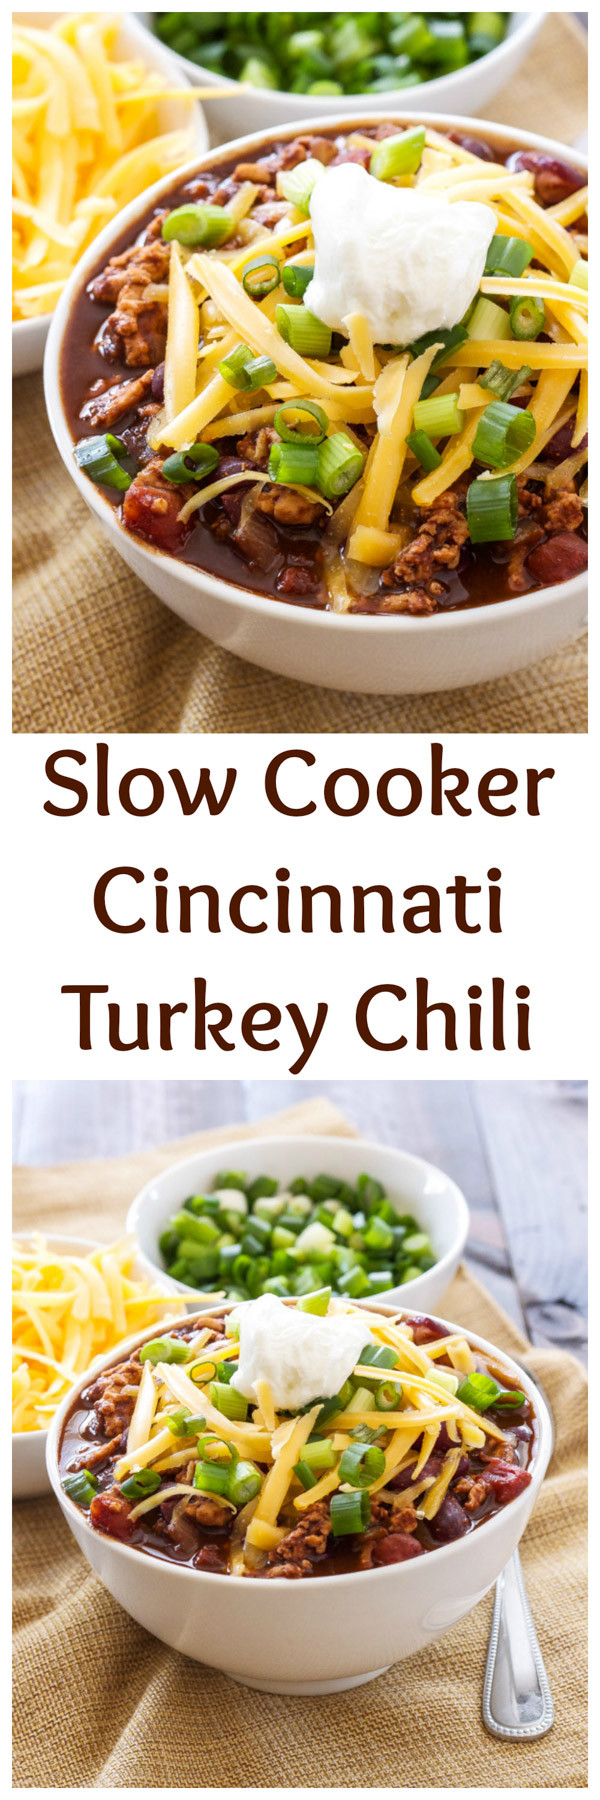 Healthy Turkey Chili Slow Cooker  Slow Cooker Cincinnati Turkey Chili Recipe Runner